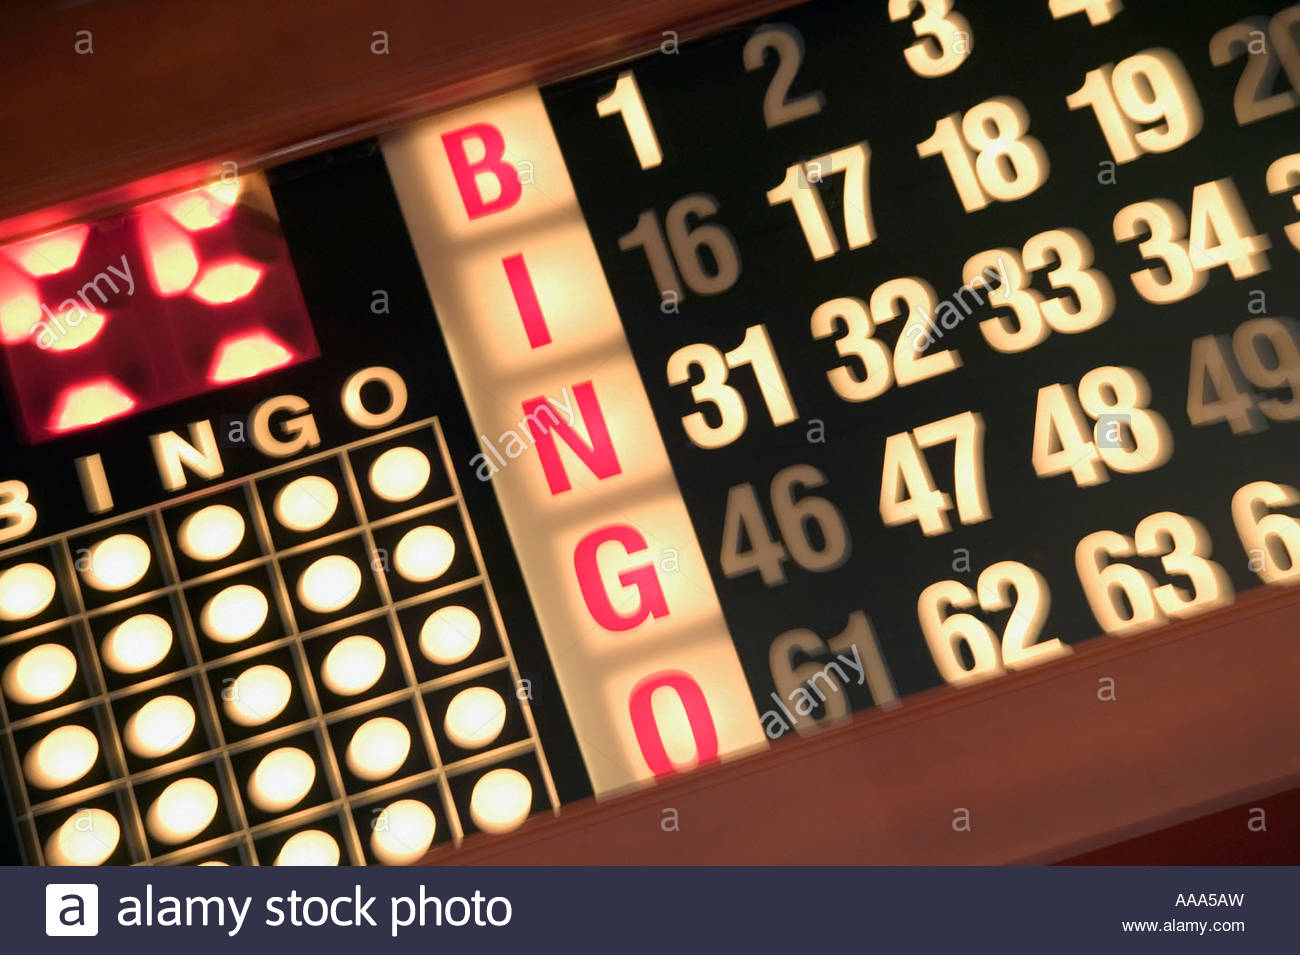 Bingo board - Stock Image